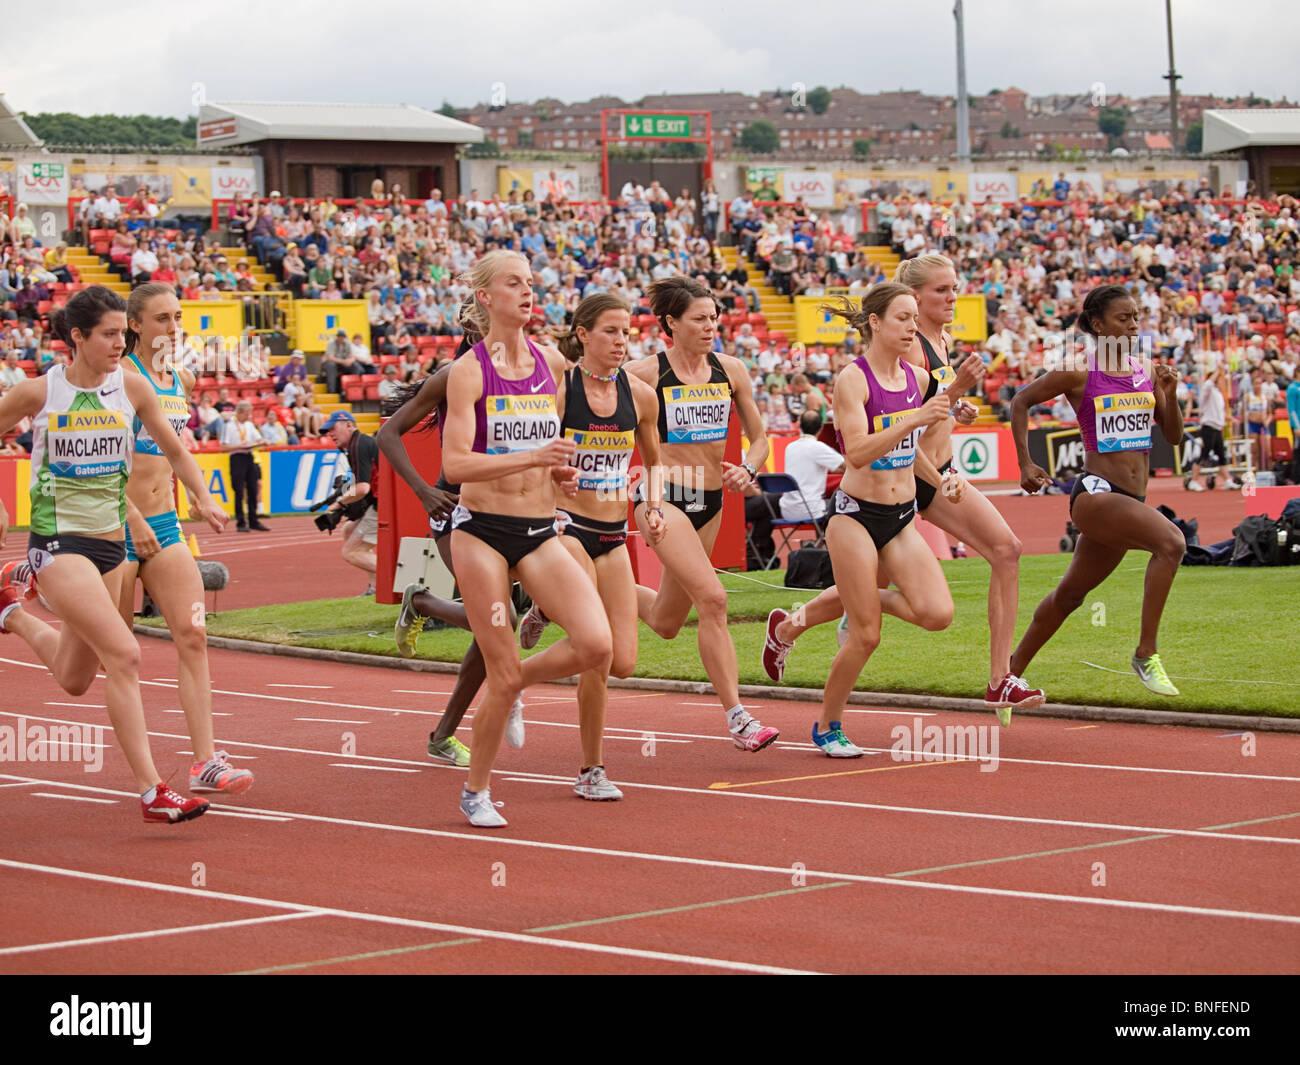 1500 meter for women at IAAF Diamond League in Gateshead 2010 - Stock Image